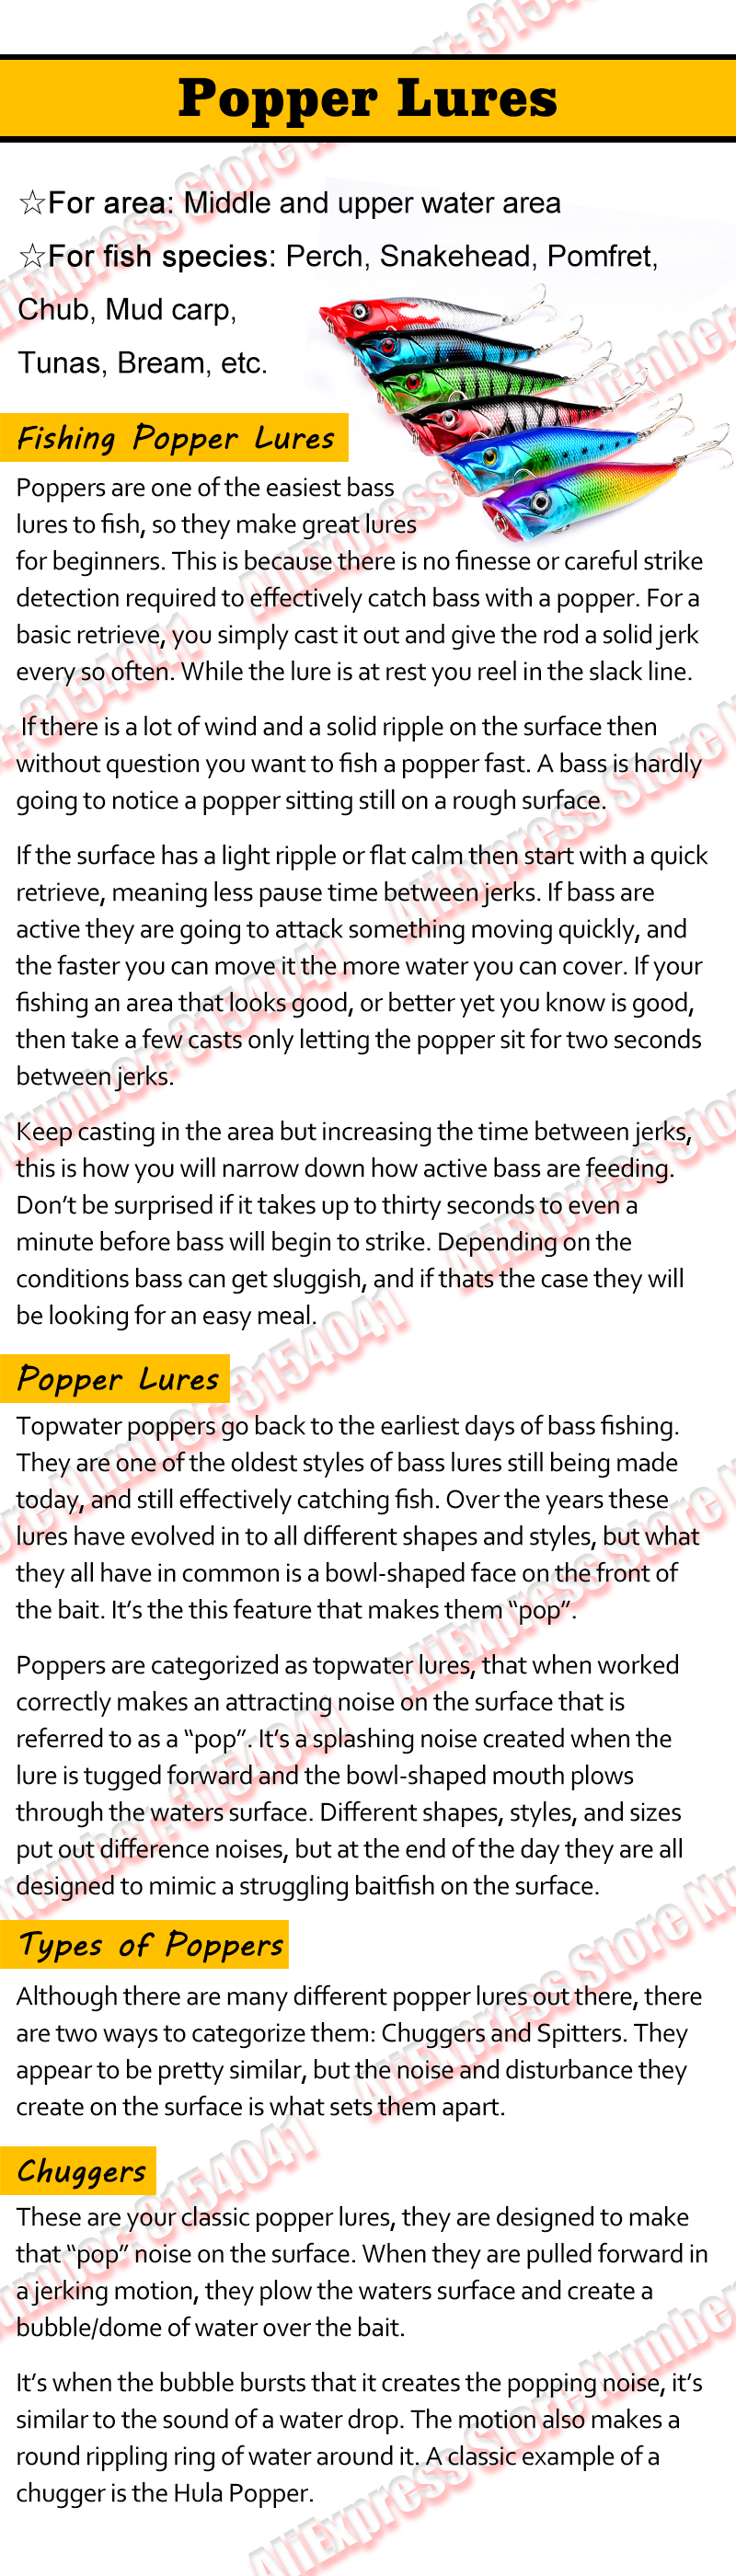 Popper lures